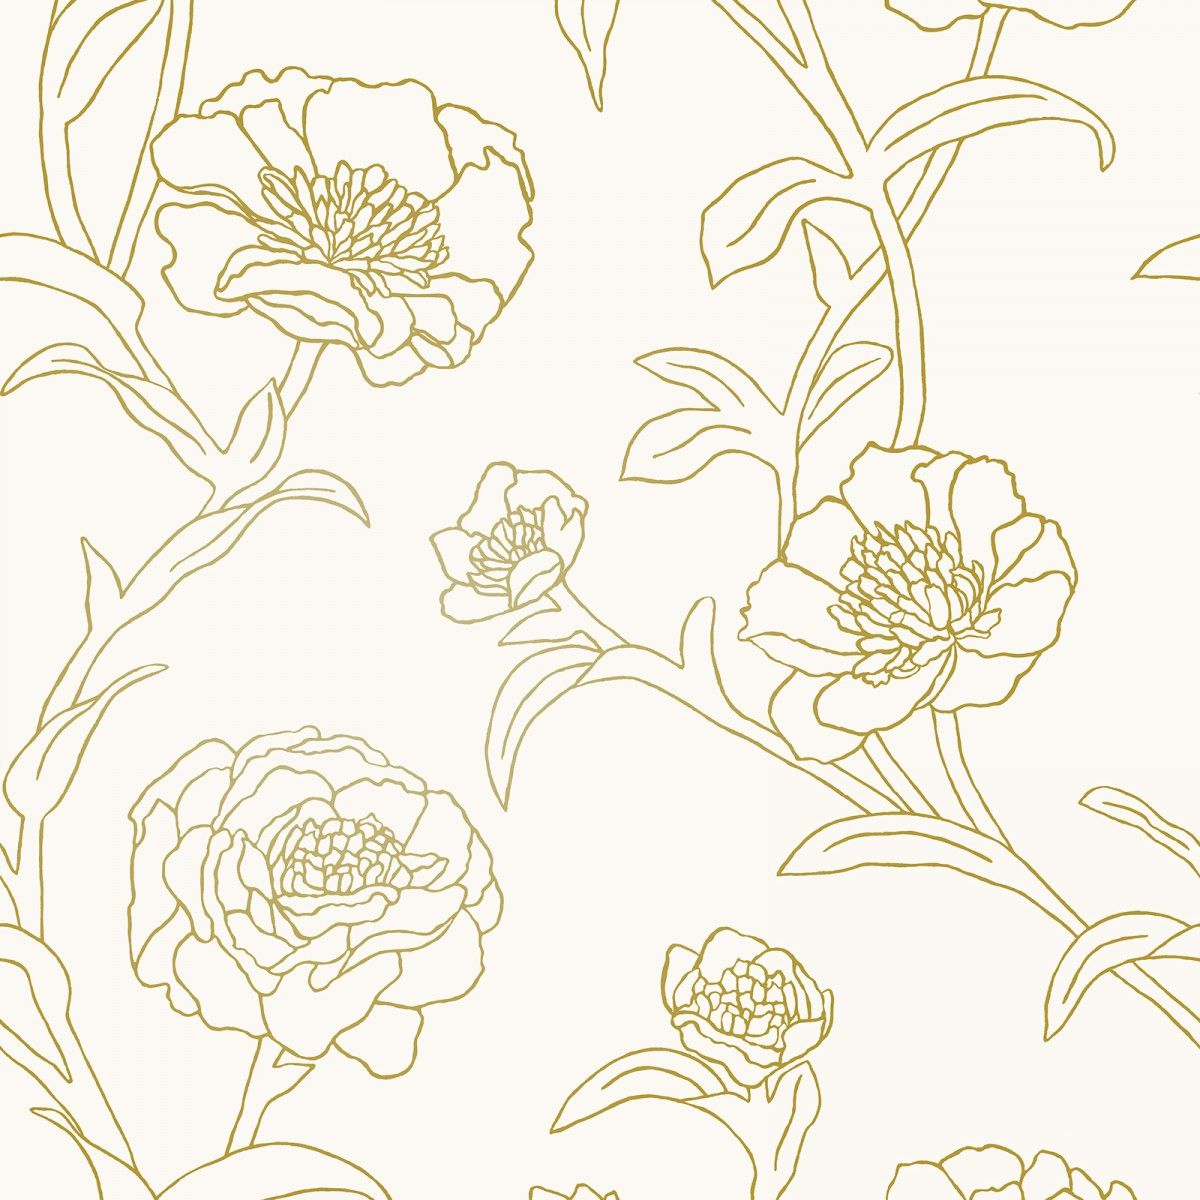 Tempaper Peonies Gold Leaf Wallpaper Tempaper Designs Peony Wallpaper Floral Wallpaper Removable Wallpaper